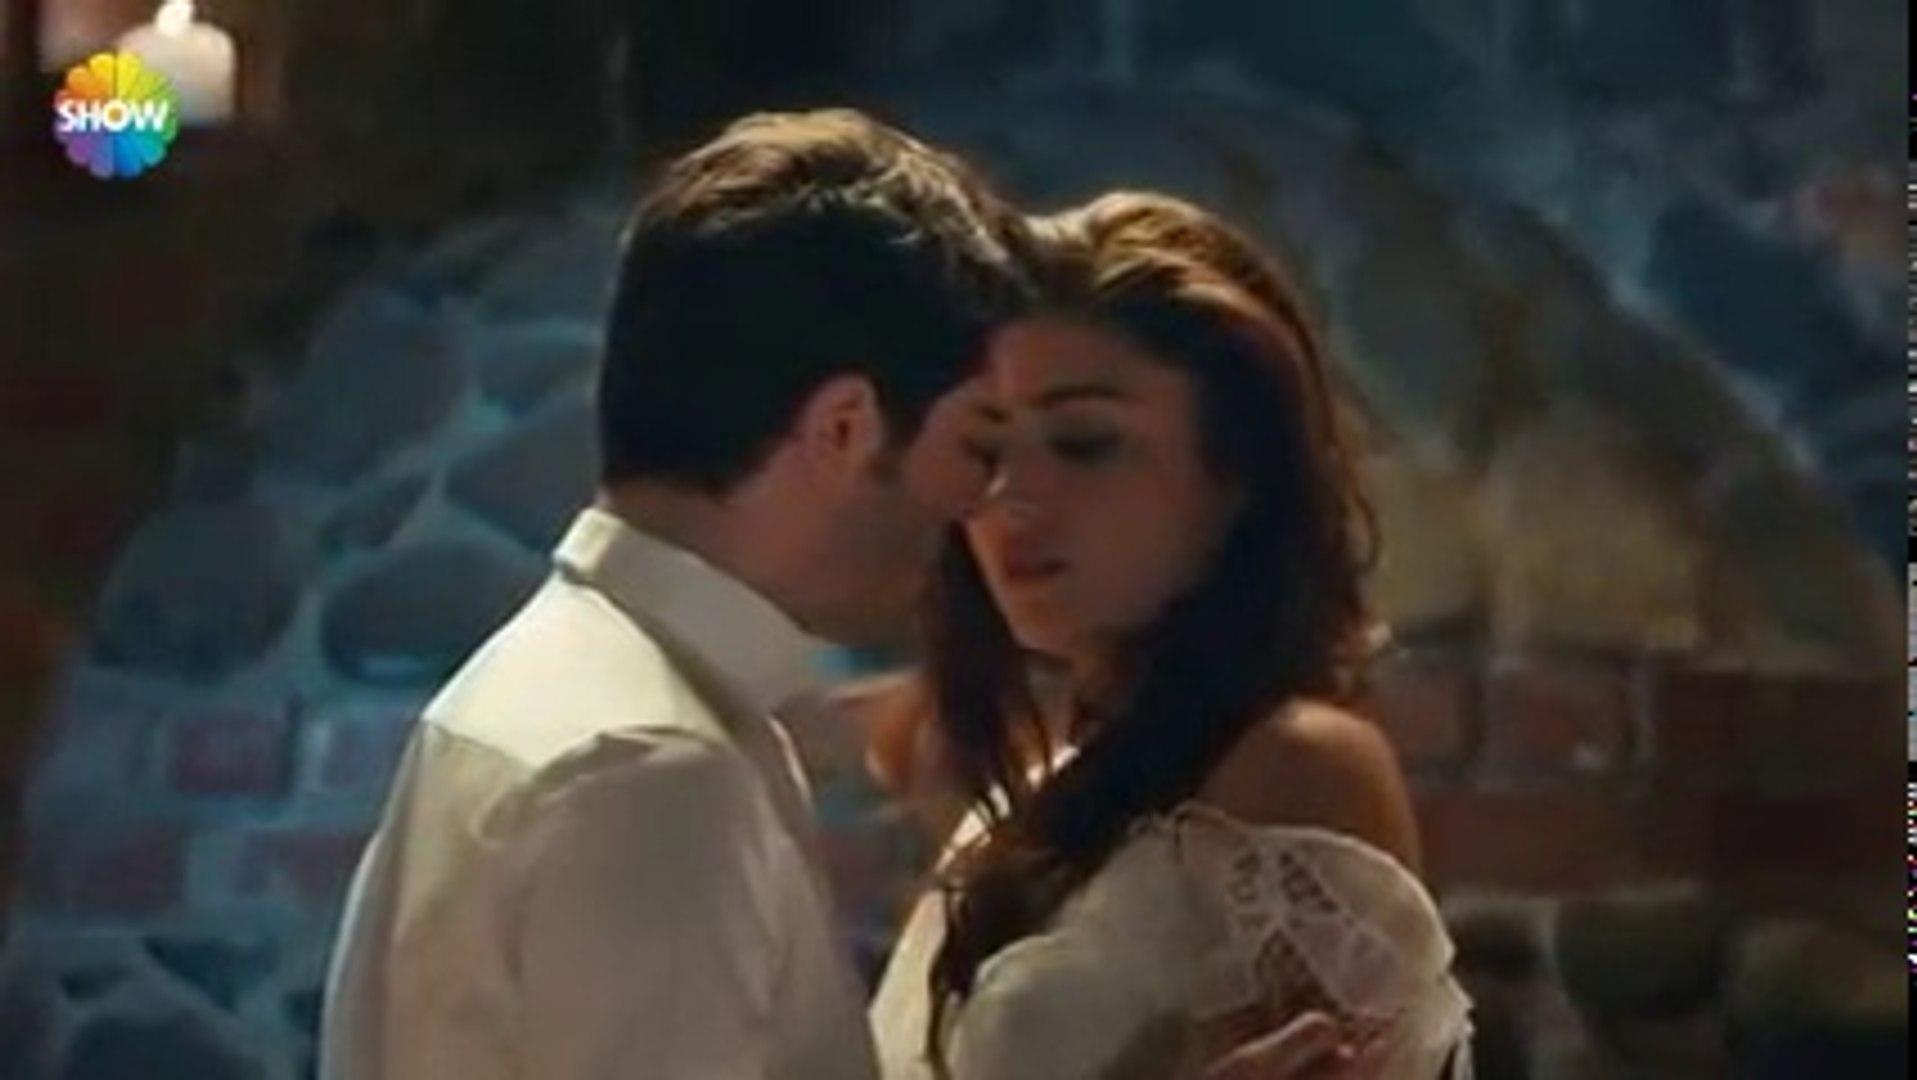 Murat & Hayat Episode 27 ( Part 11 ) English Subtitles - Ask Laftan Anlamaz